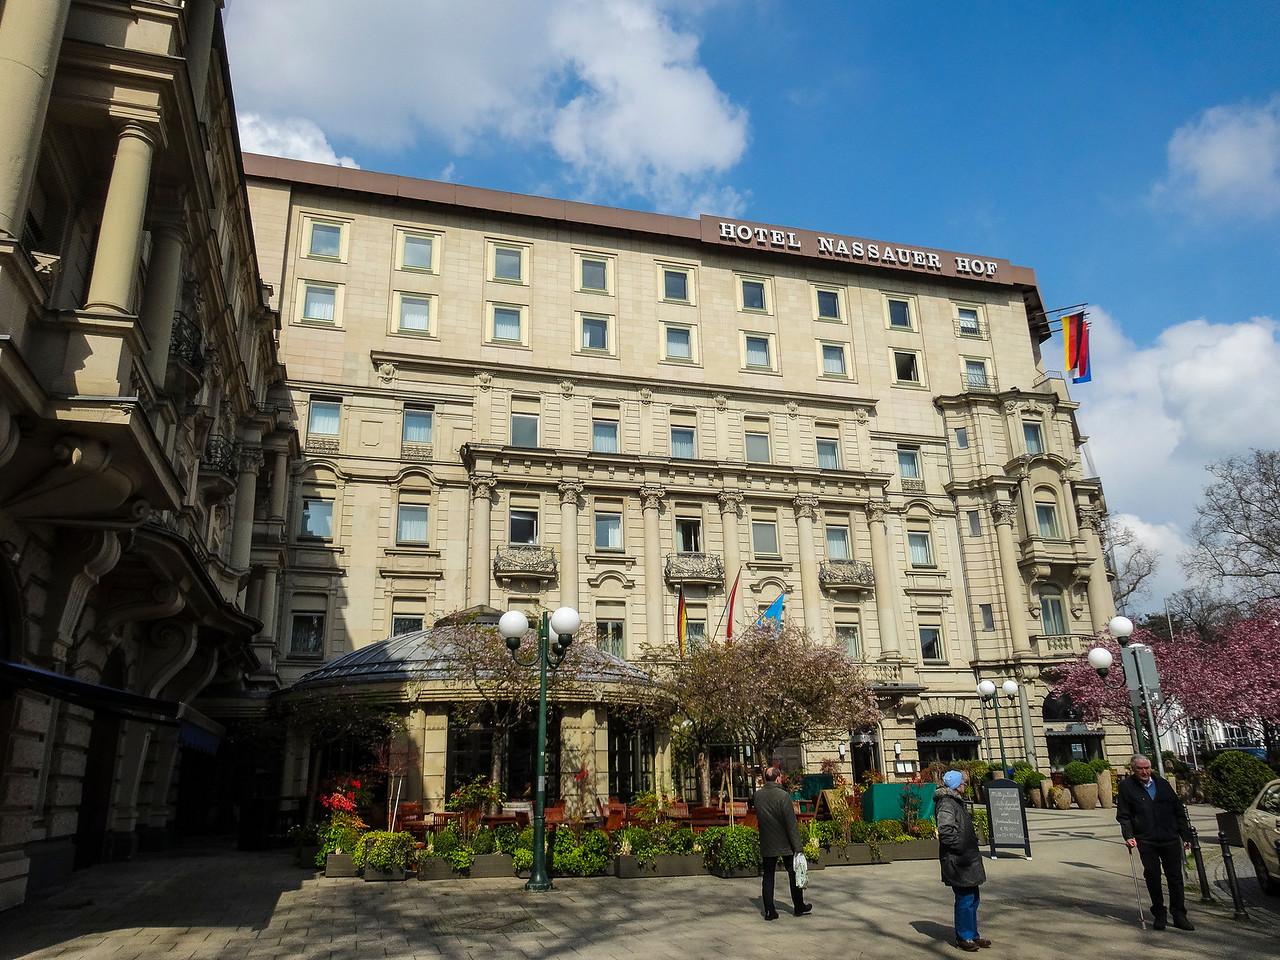 The Hotel Nassauer Hof, our home in Weisbaden